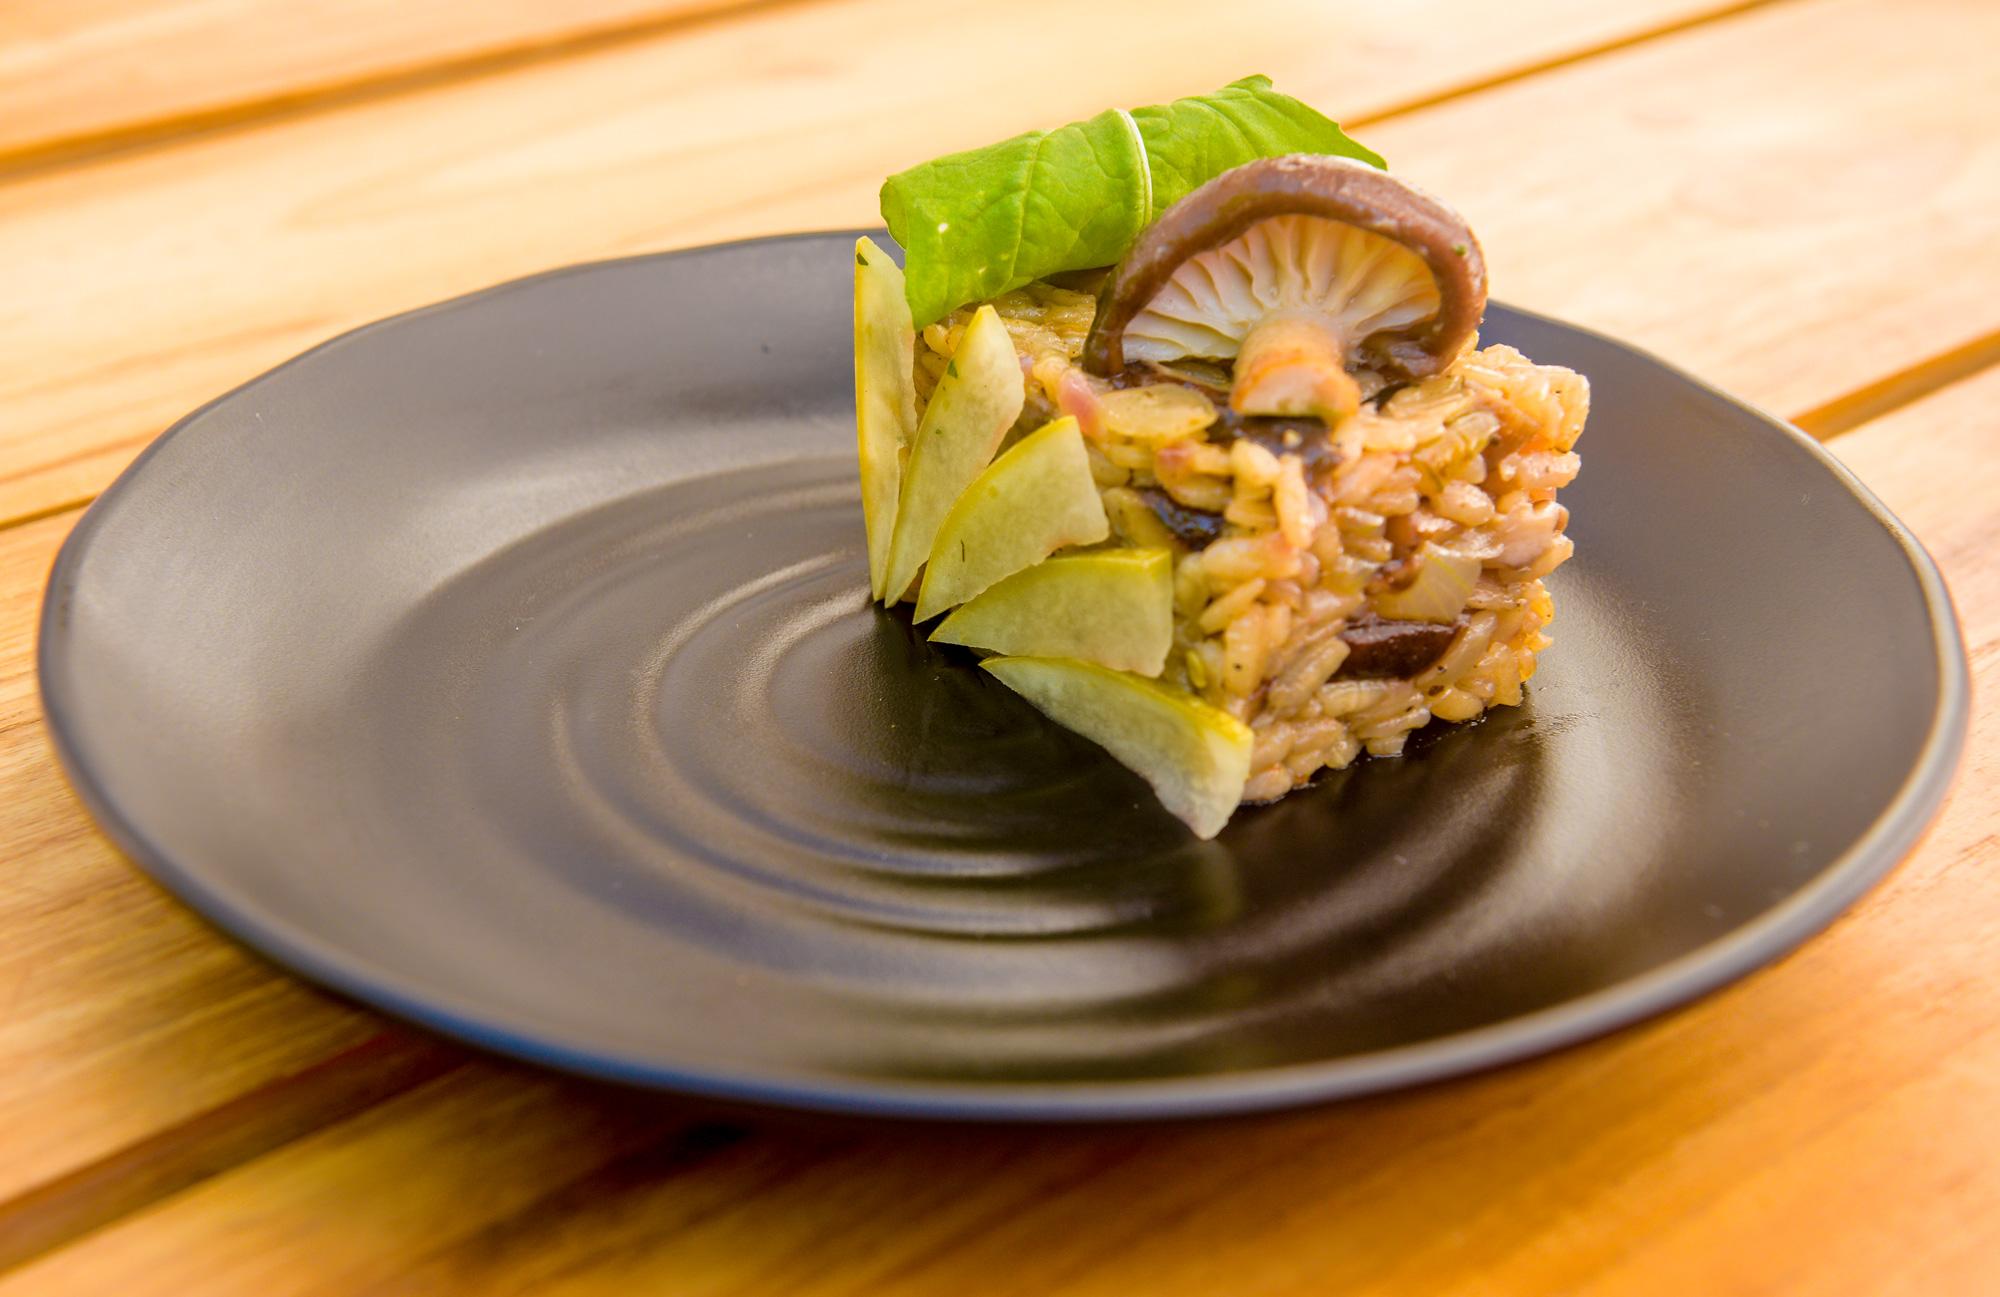 Shitake-mushroom-risoto-with-pickled-watermelon-skin-and-arugula.jpg